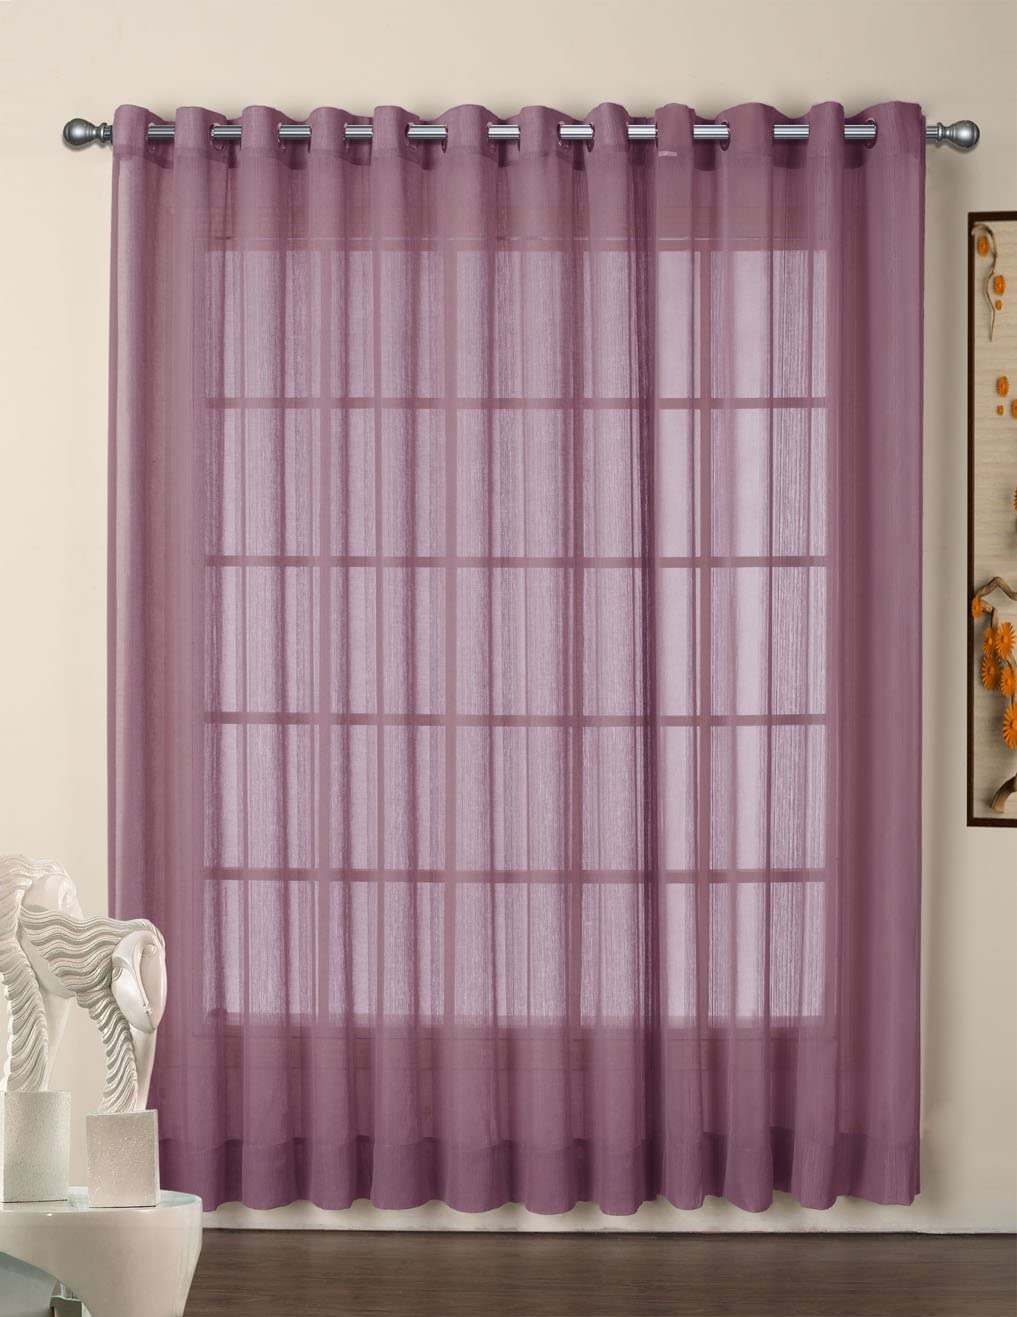 R.LANG Grommet Top Sheer Curtains Voile Window Panel 1 Pair Deep Purple W52 x L108 Set of 2 Panels